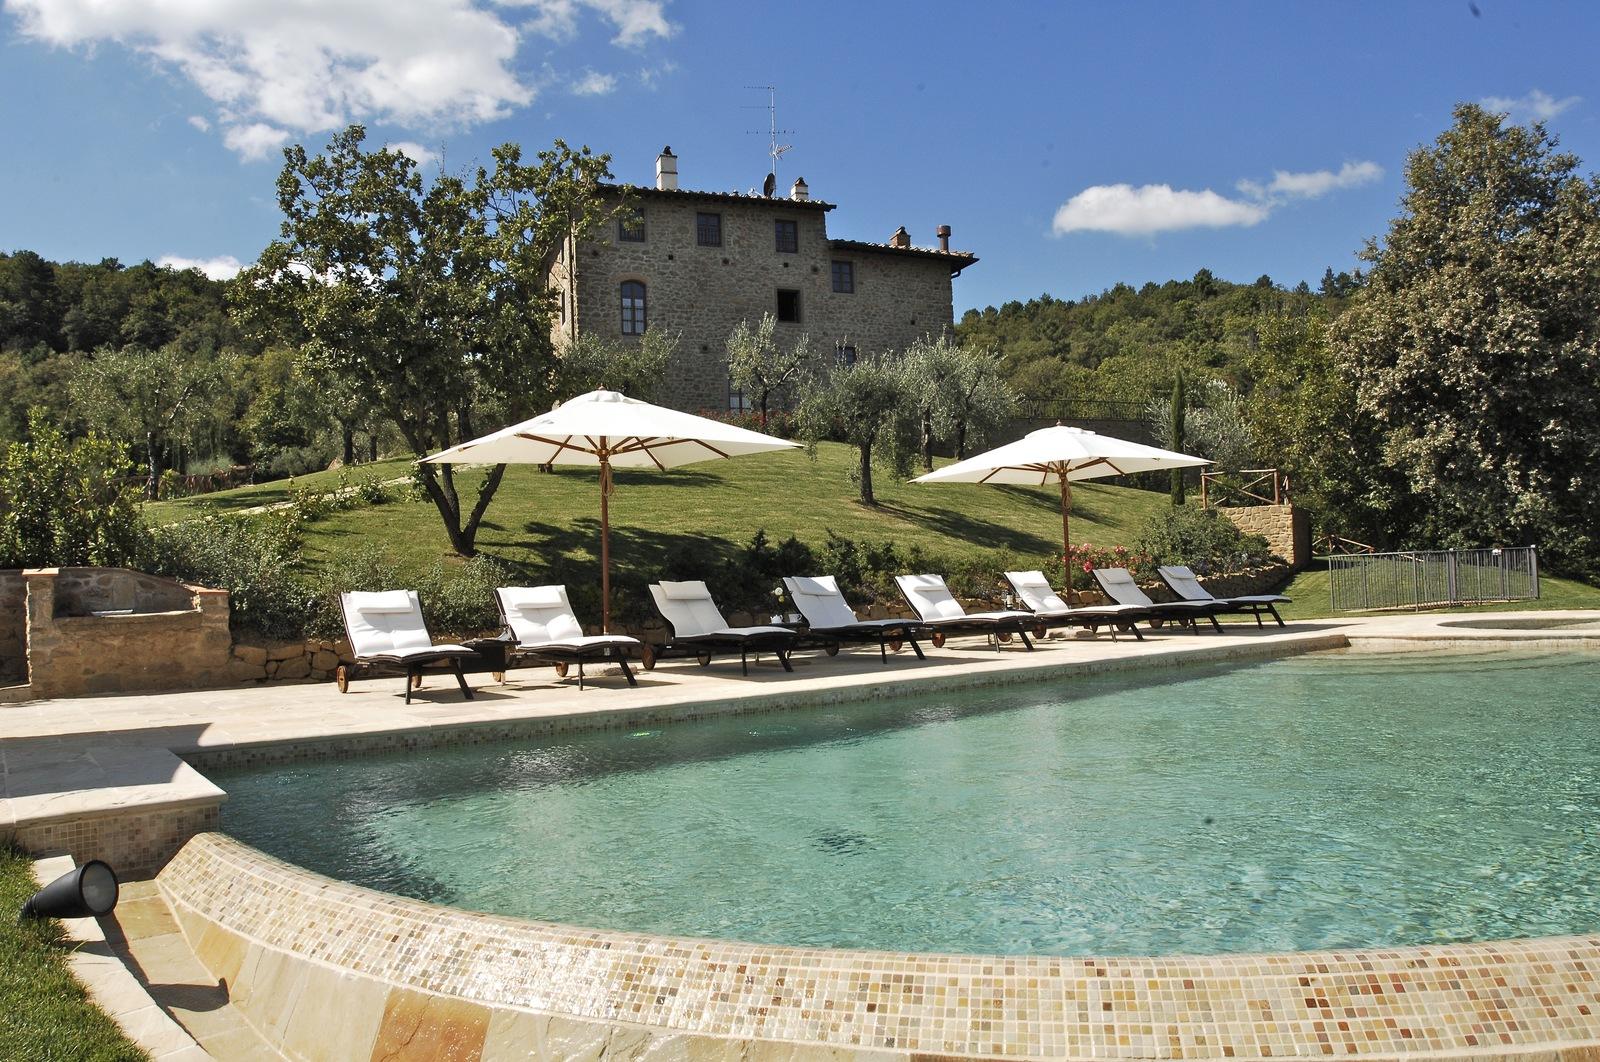 Montevarchi - Gaiole in Chianti